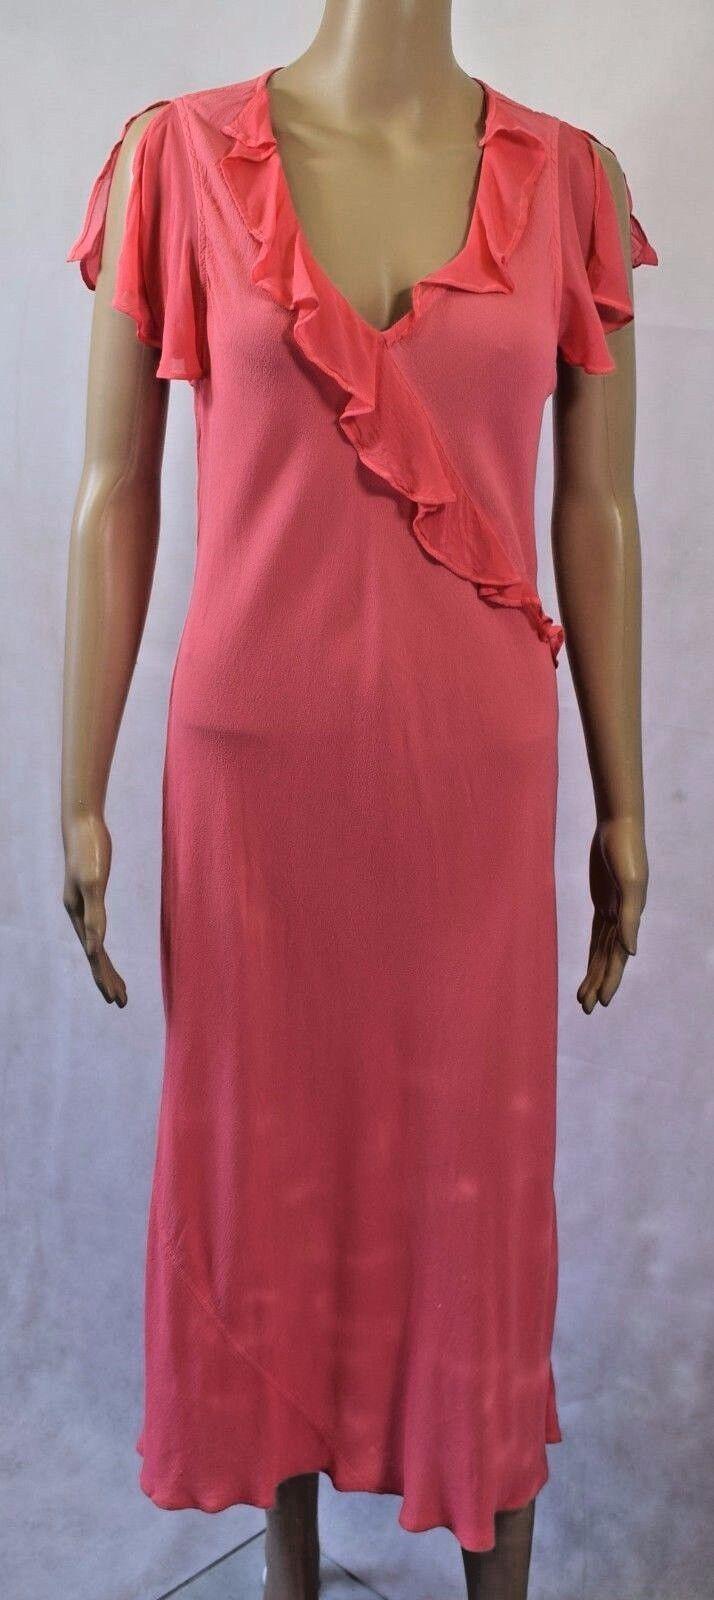 Bnwt Ghost London Coppelia Karen Dress In Blaush - UK M -    (R103)